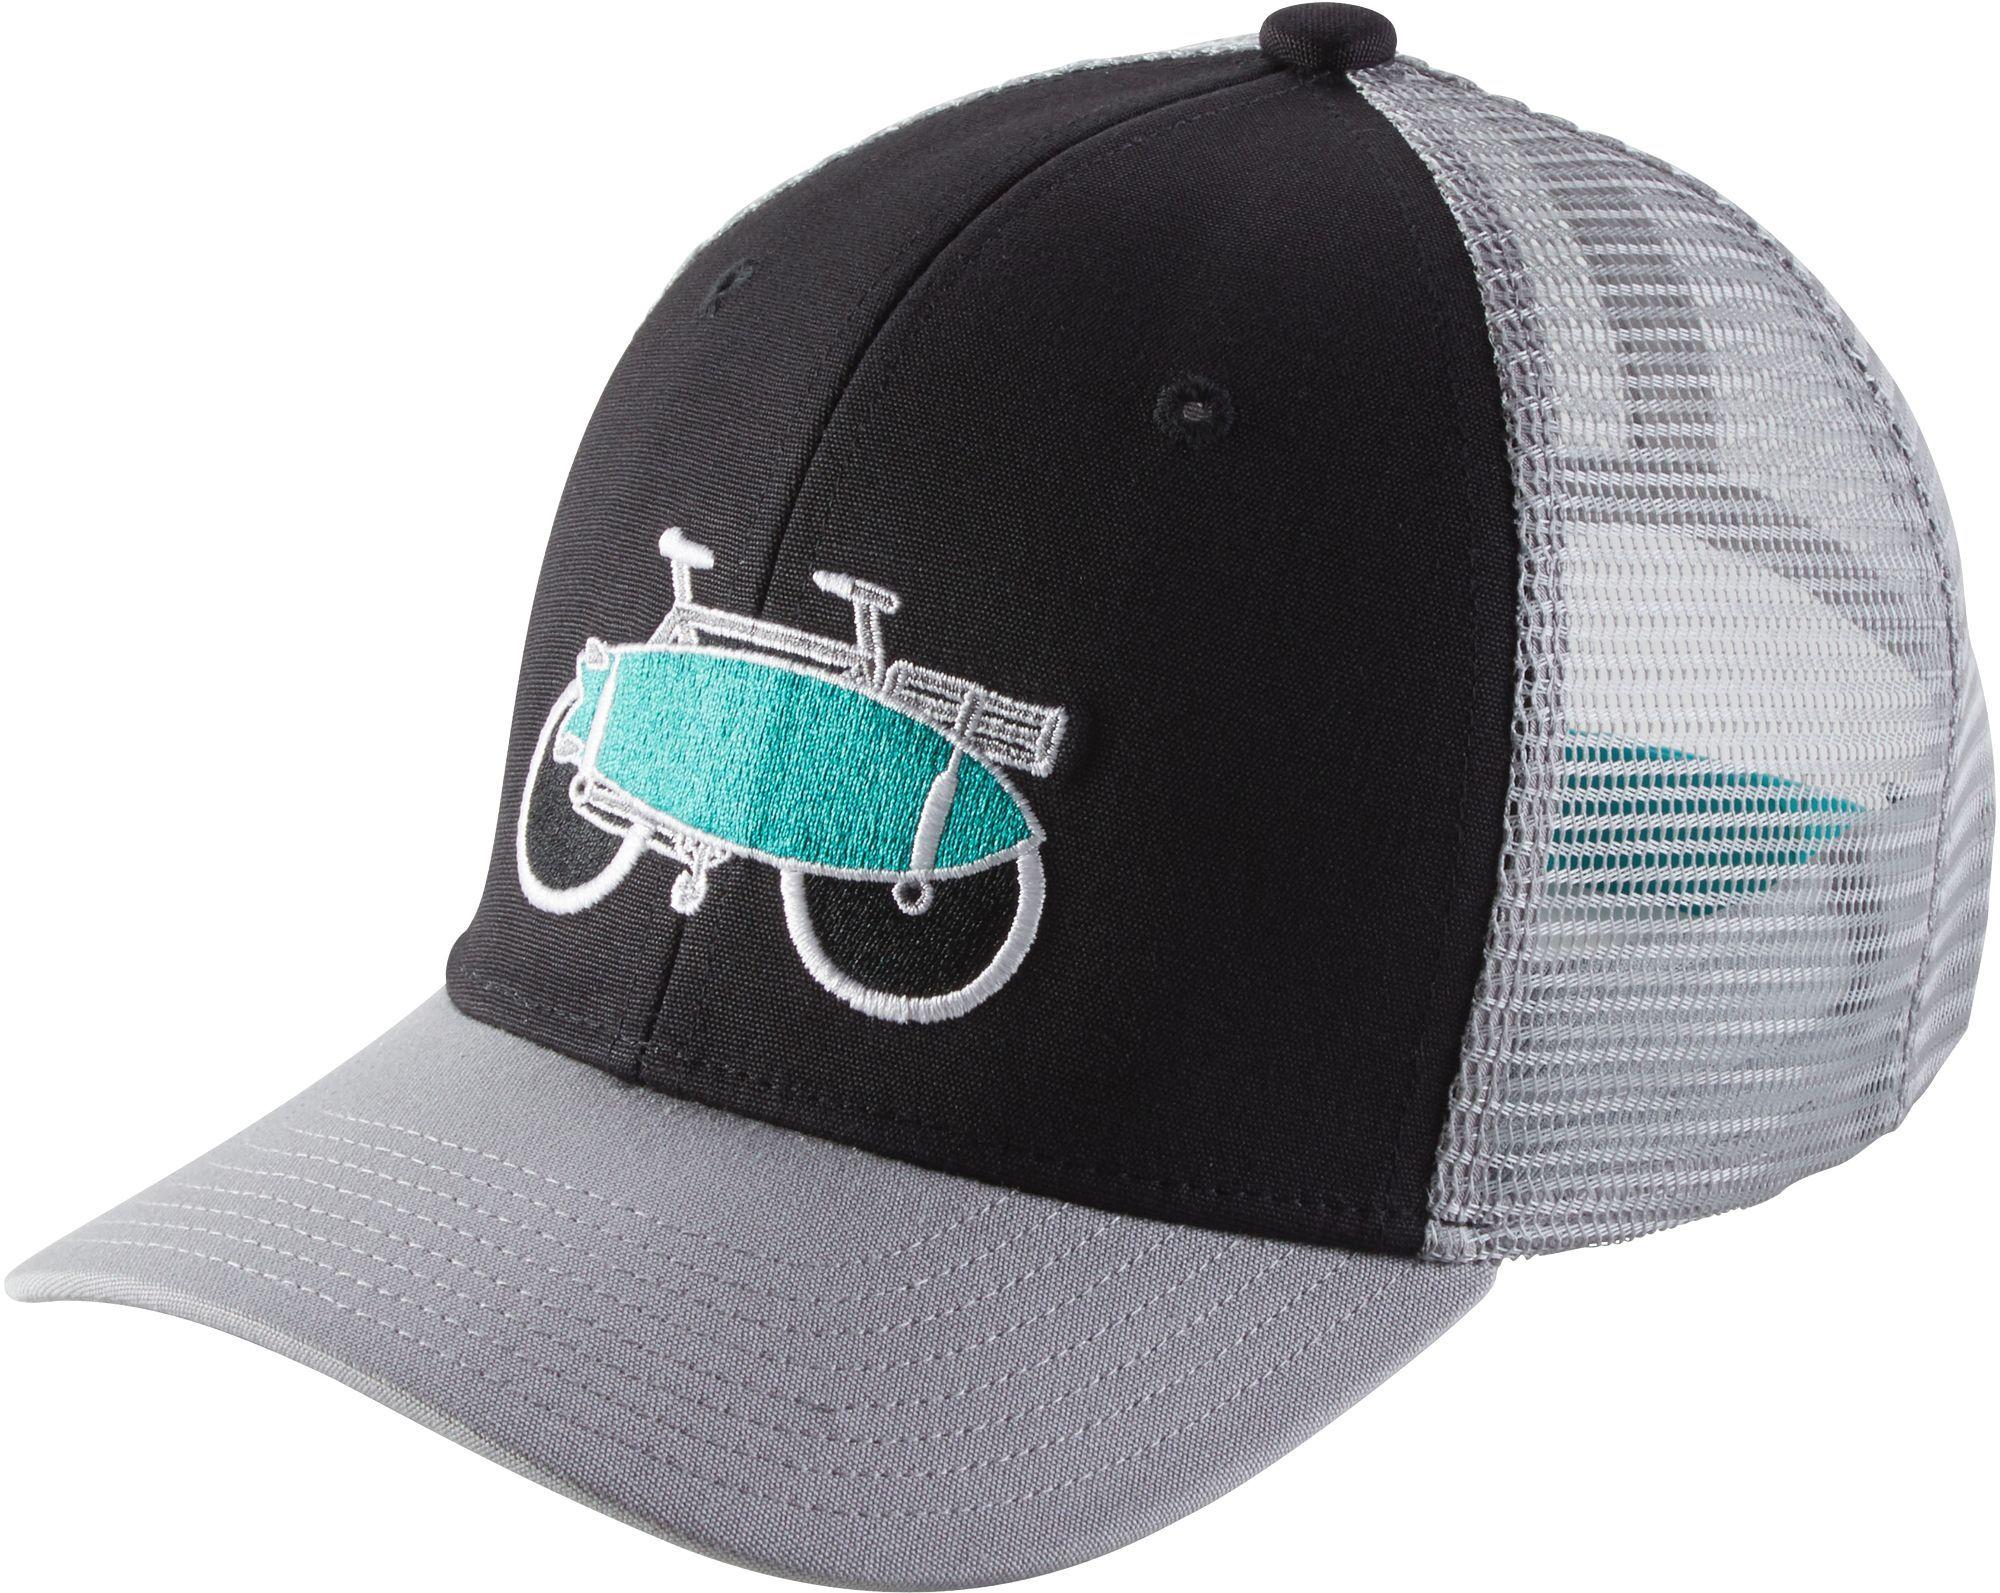 fc539b30ddaeb Patagonia Youth Trucker Hat   Products   Patagonia kids, Hats, Patagonia